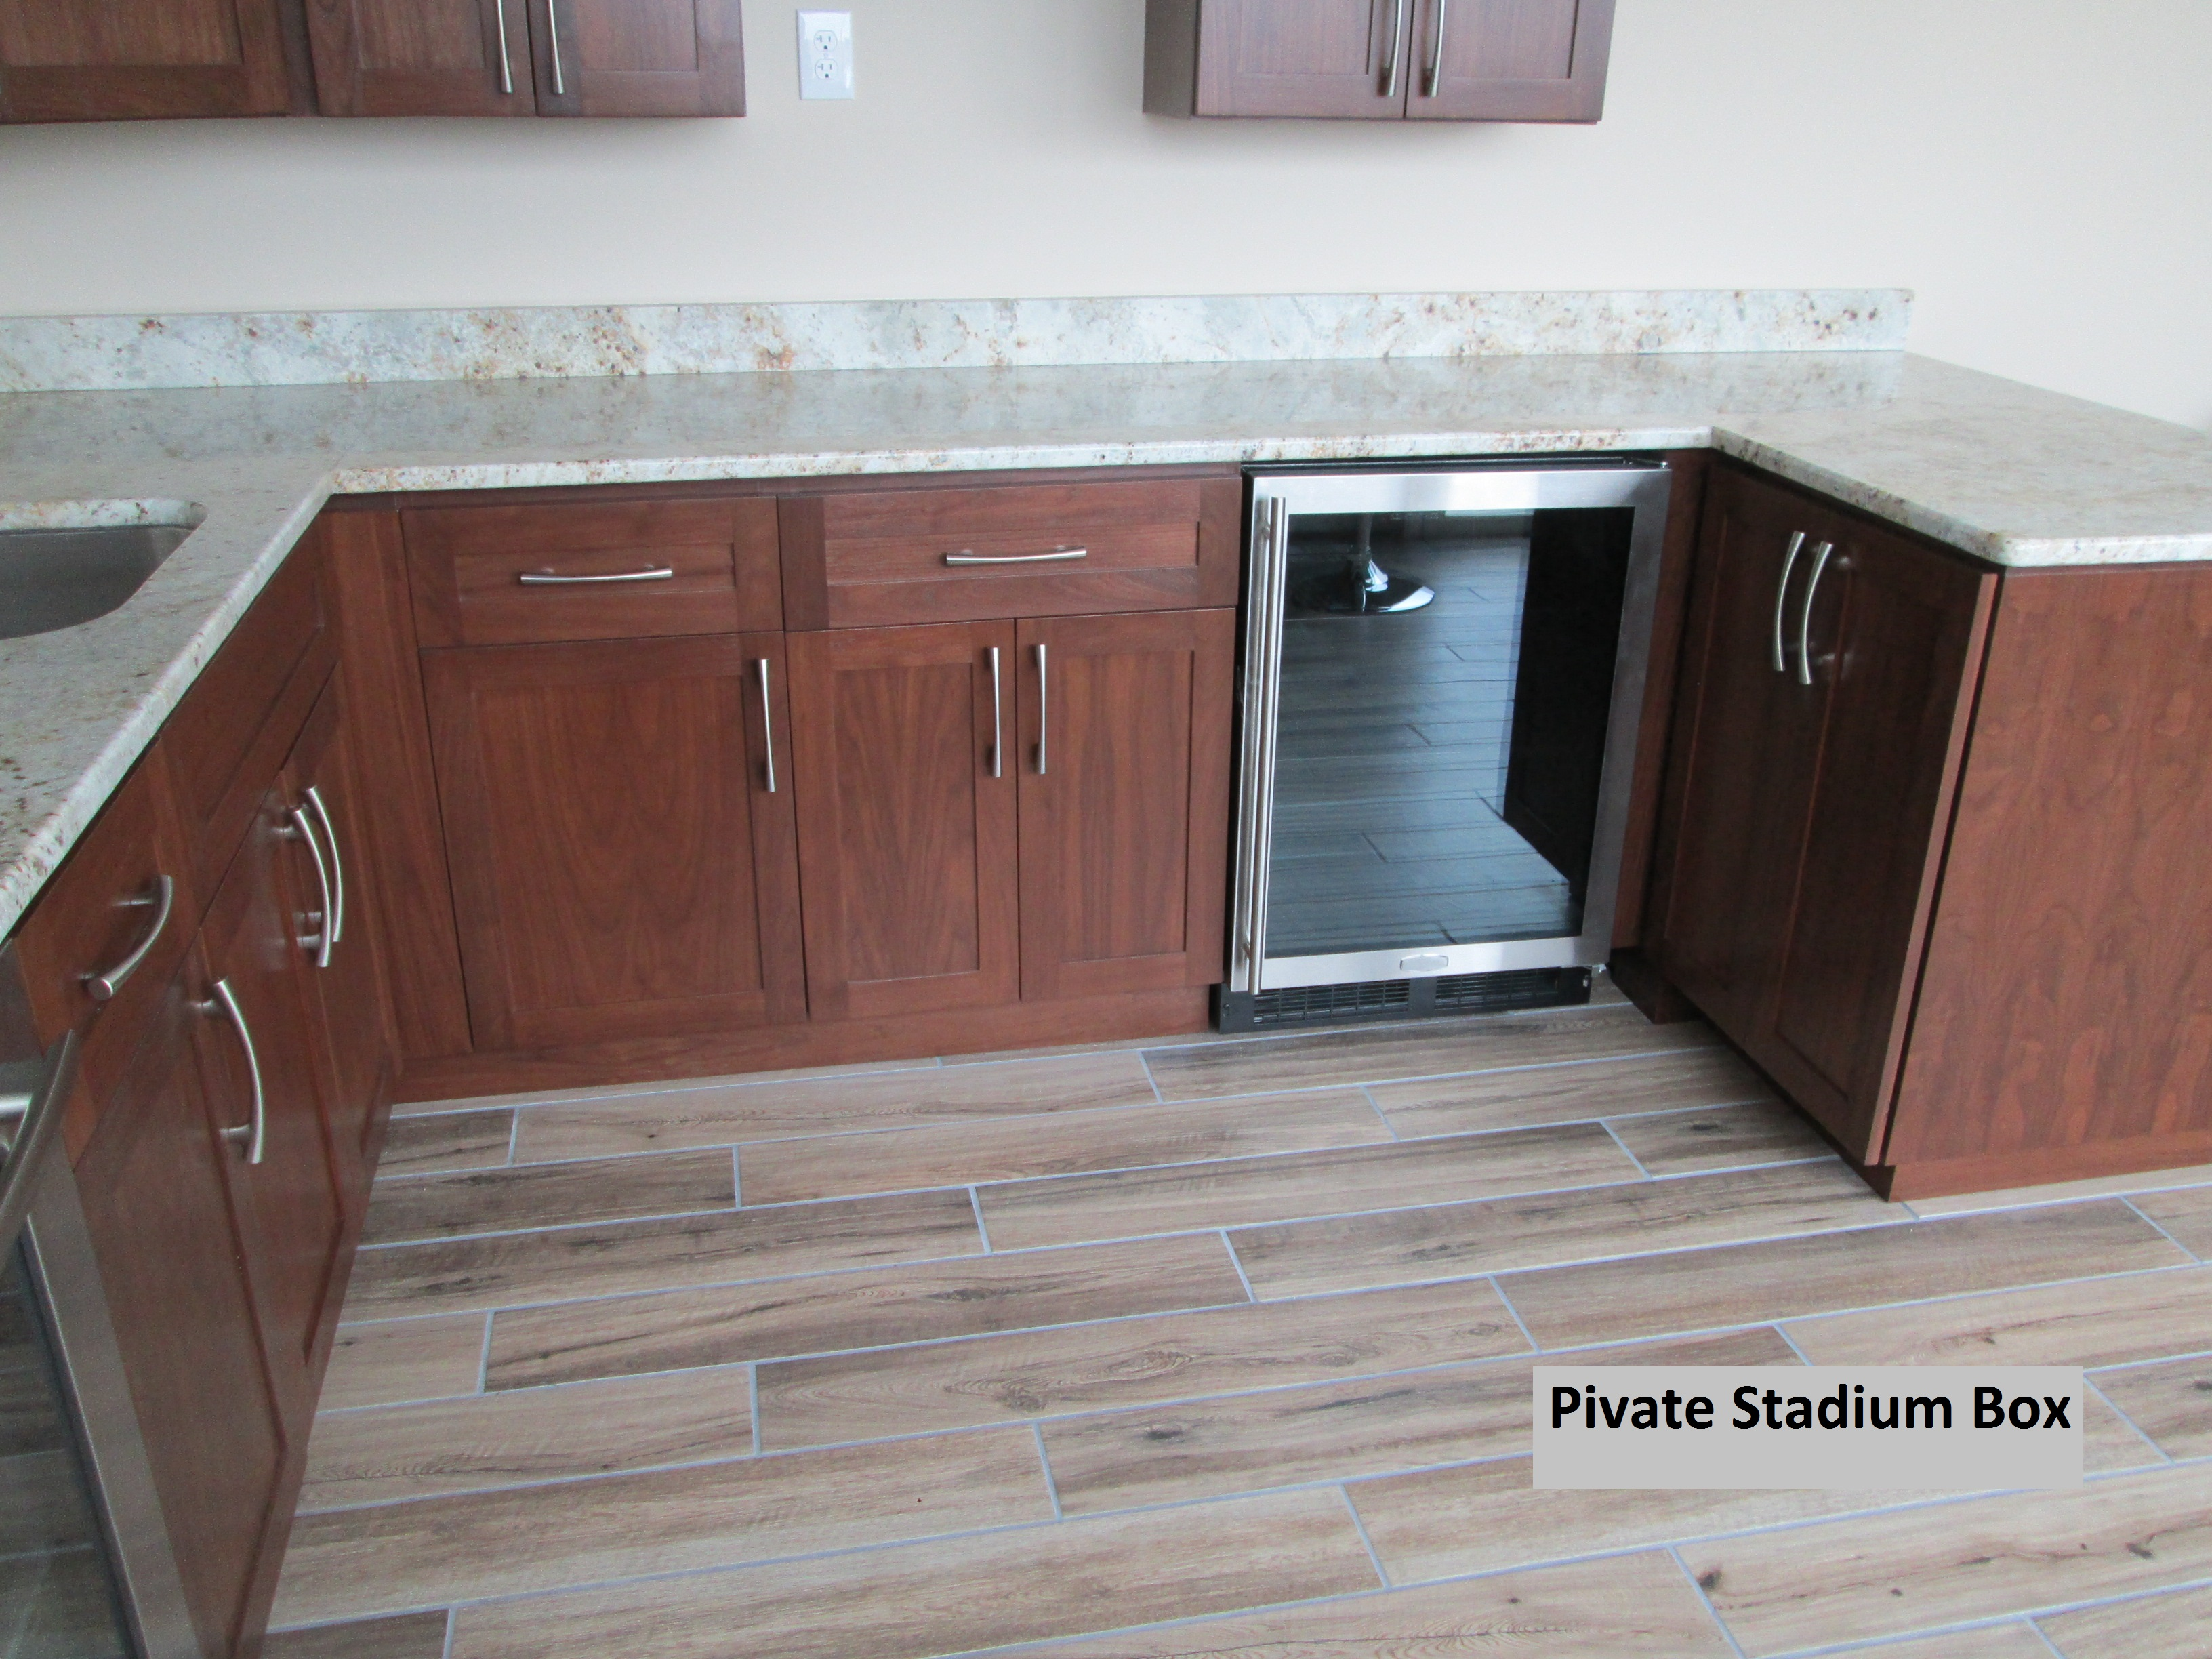 stadium box kitchen cabinets syracuse